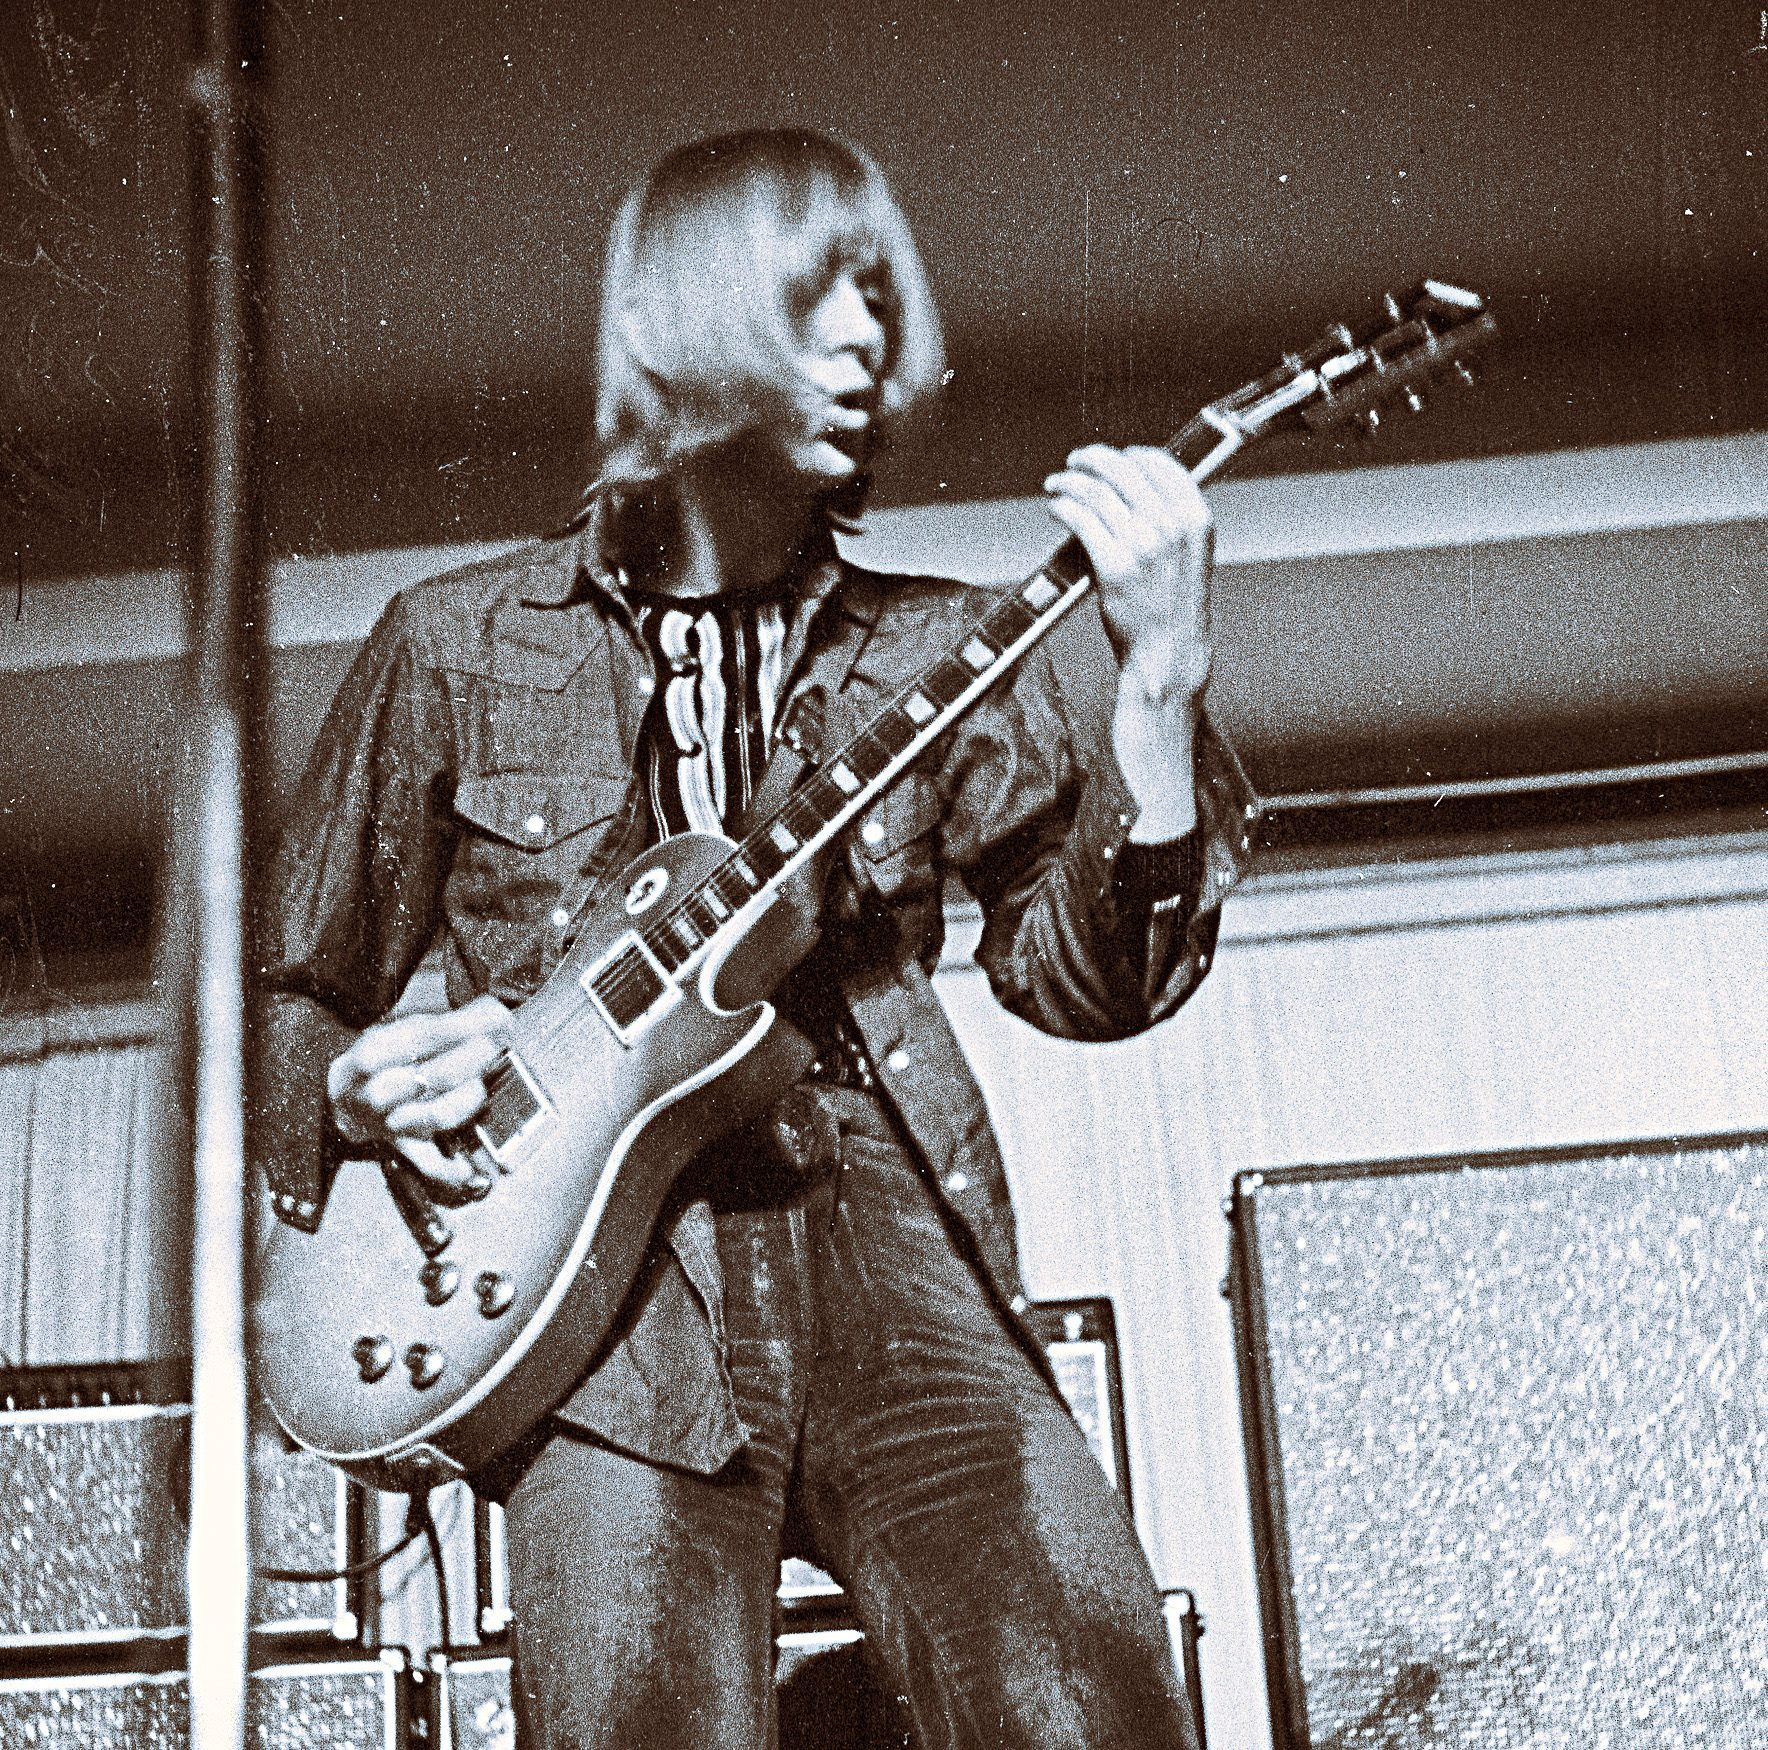 Fleetwood Mac Danny Kirwan 12 e1606217895264 10 Things You Never Knew About Fleetwood Mac